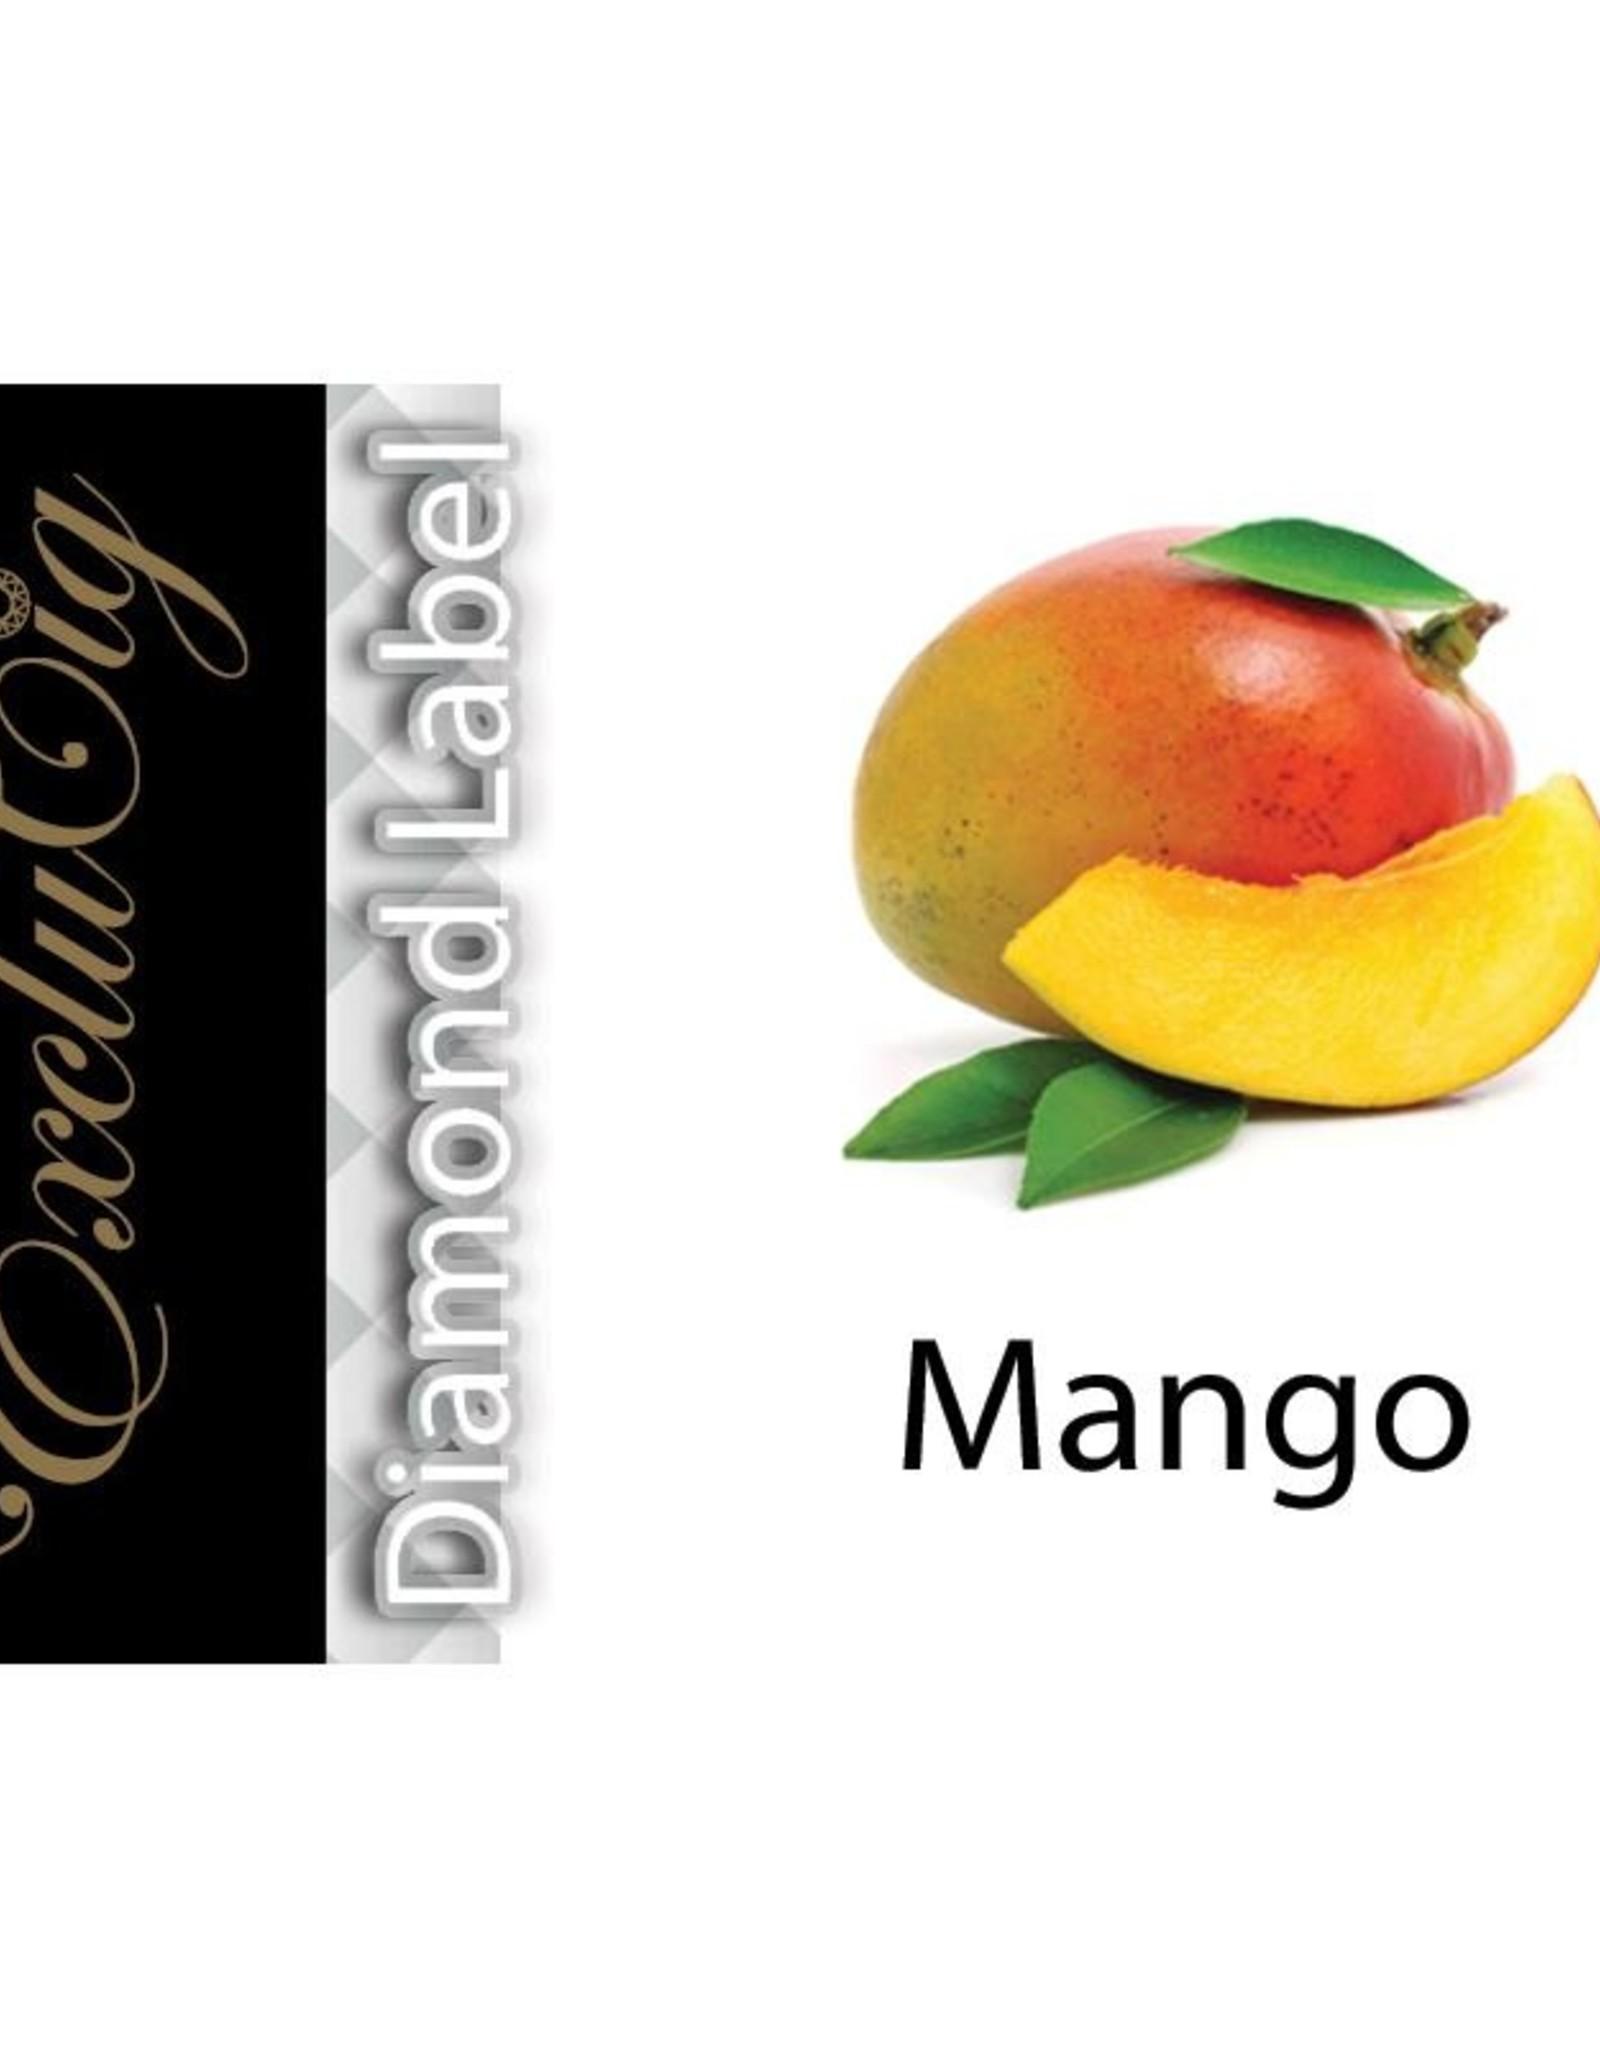 Exclucig Exclucig Diamond Label E-liquid Mango 3 mg Nicotine